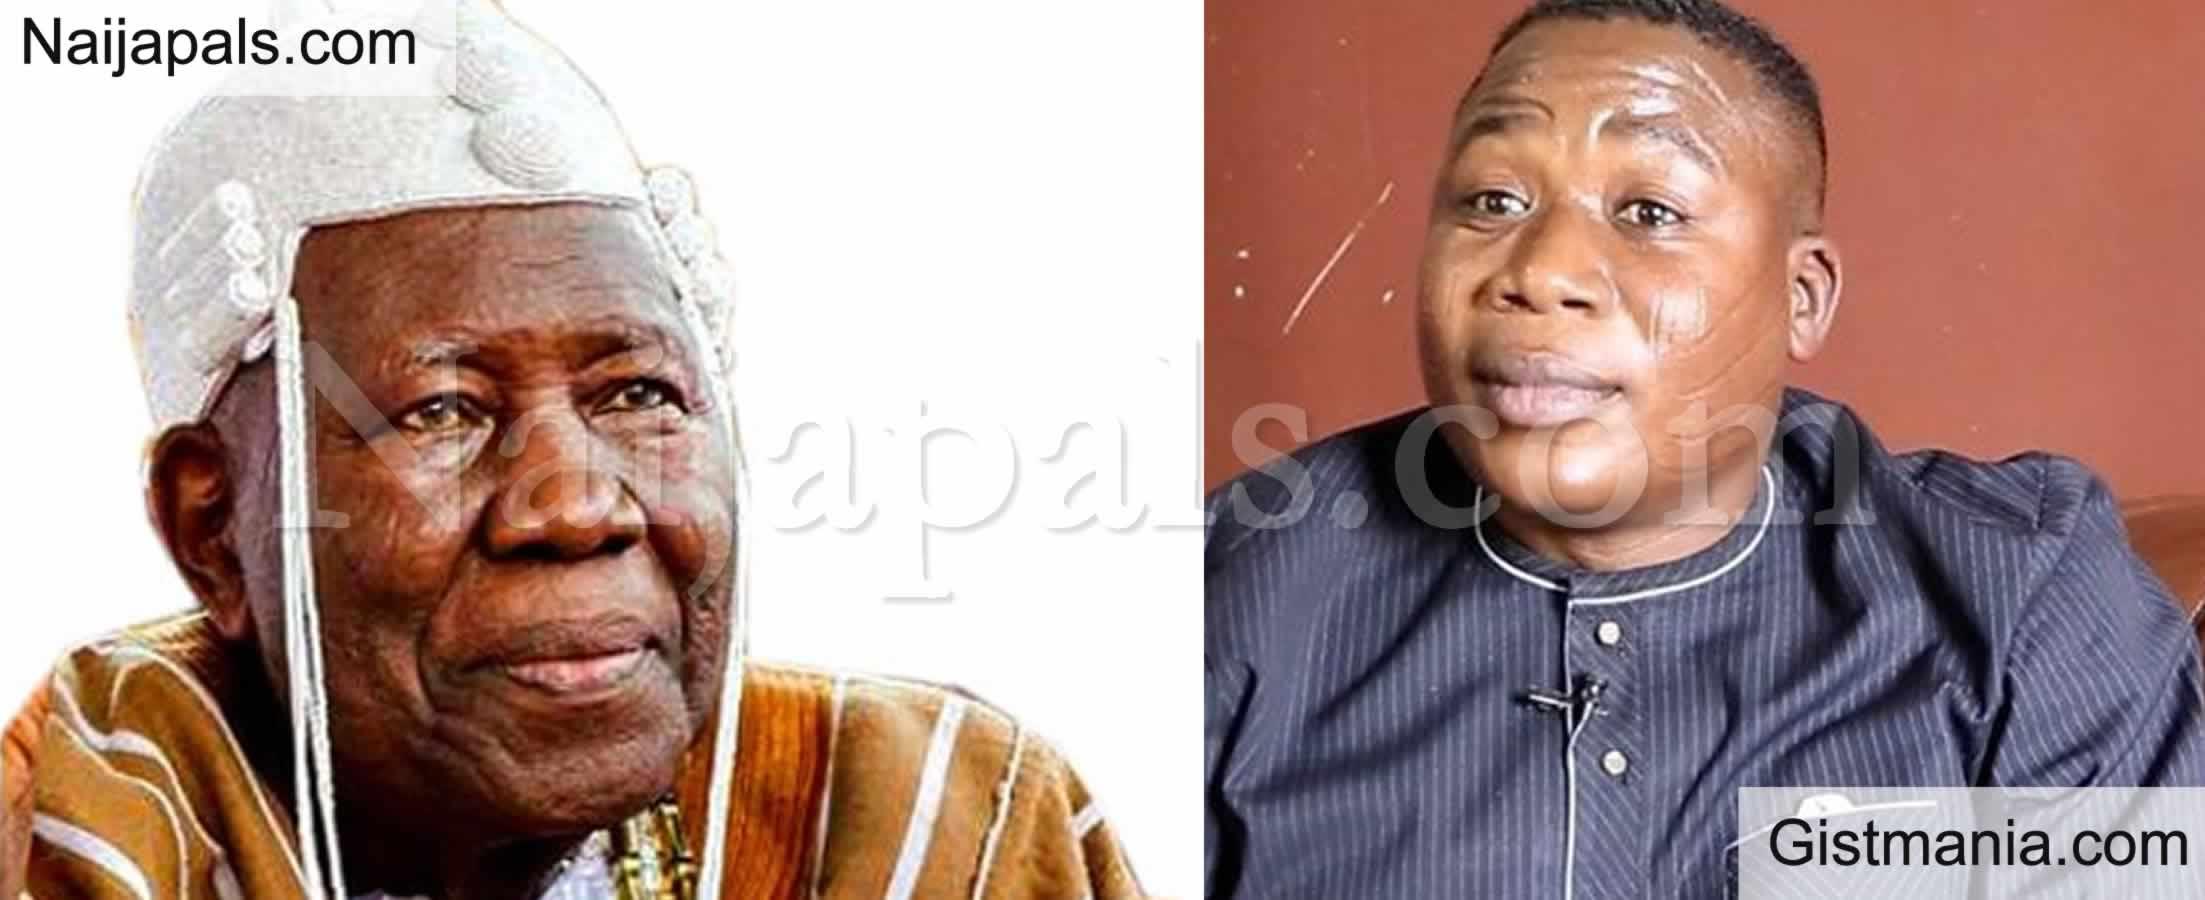 <img alt='.' class='lazyload' data-src='https://img.gistmania.com/emot/comment.gif' /> <b>Olubadan, Oba Saliu Adetunji Sends Delegation To Cotonou Over Sunday Igboho's Trial</b>